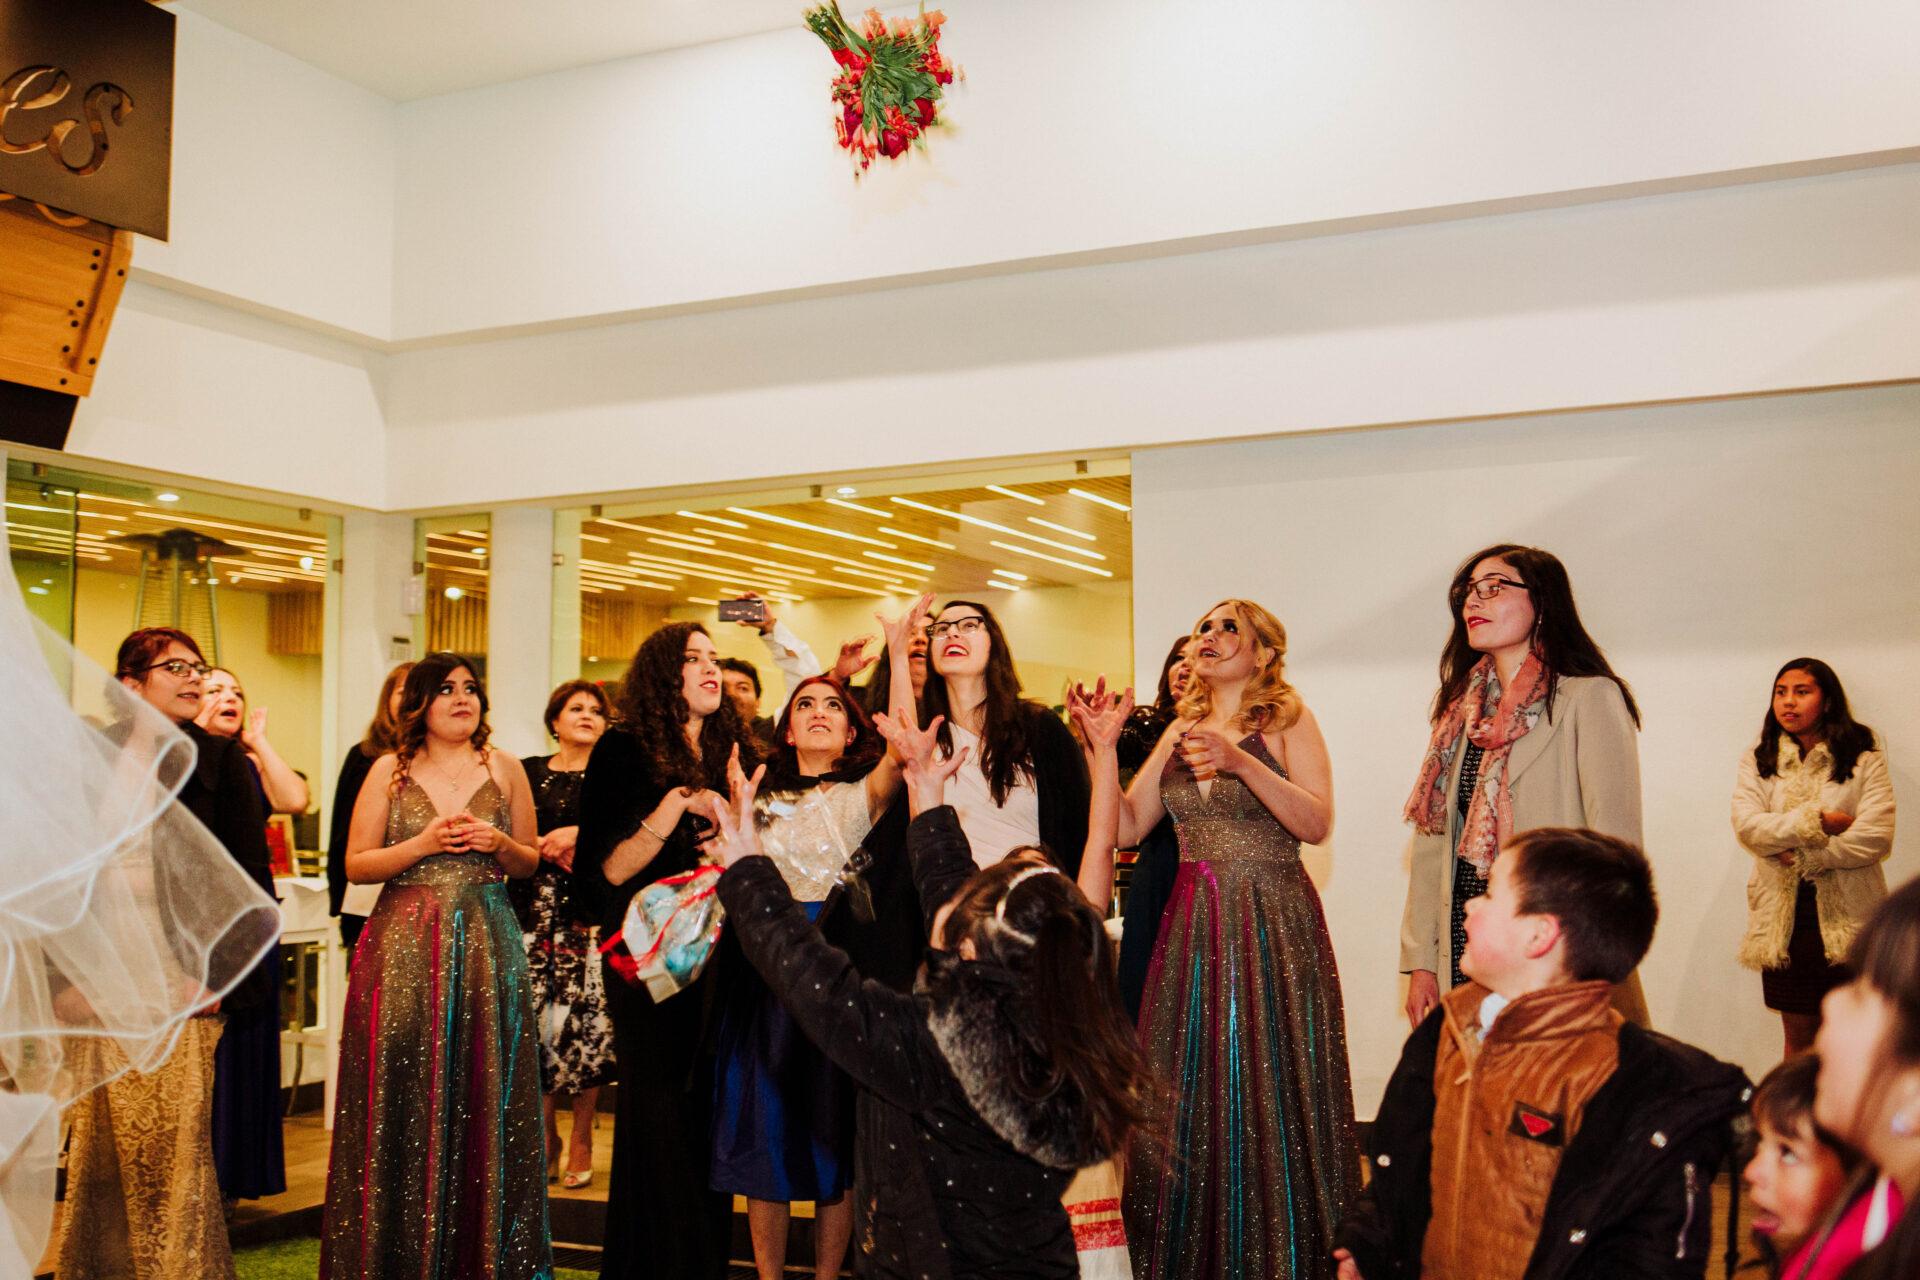 javier_noriega_fotografo_bodas_gaviones_zacatecas_wedding_photographer35